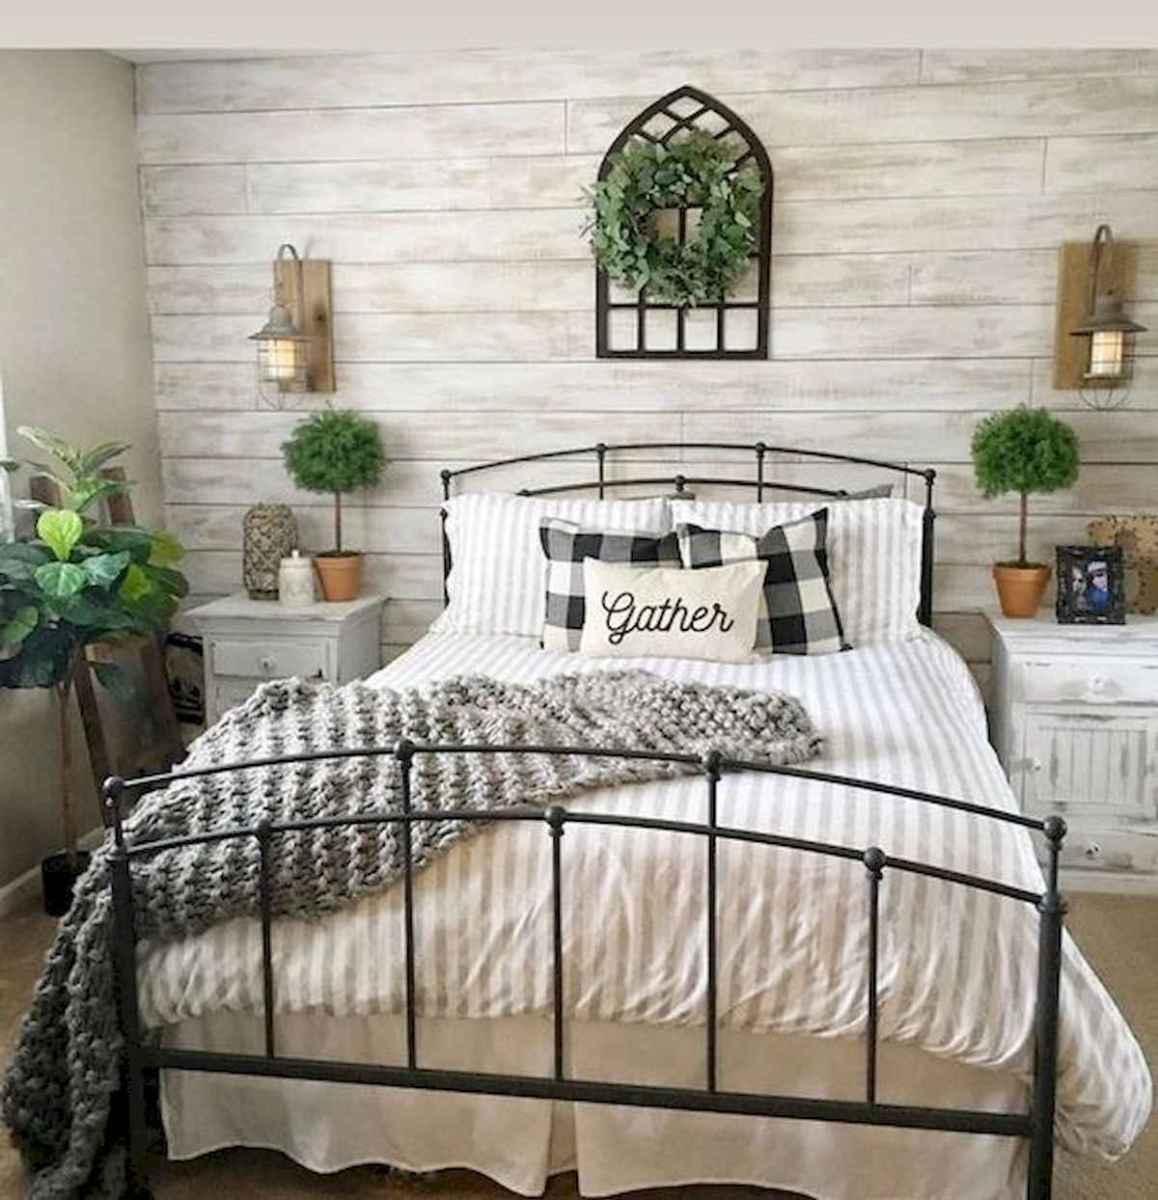 50 Favorite Bedding for Farmhouse Bedroom Design Ideas and Decor (35)